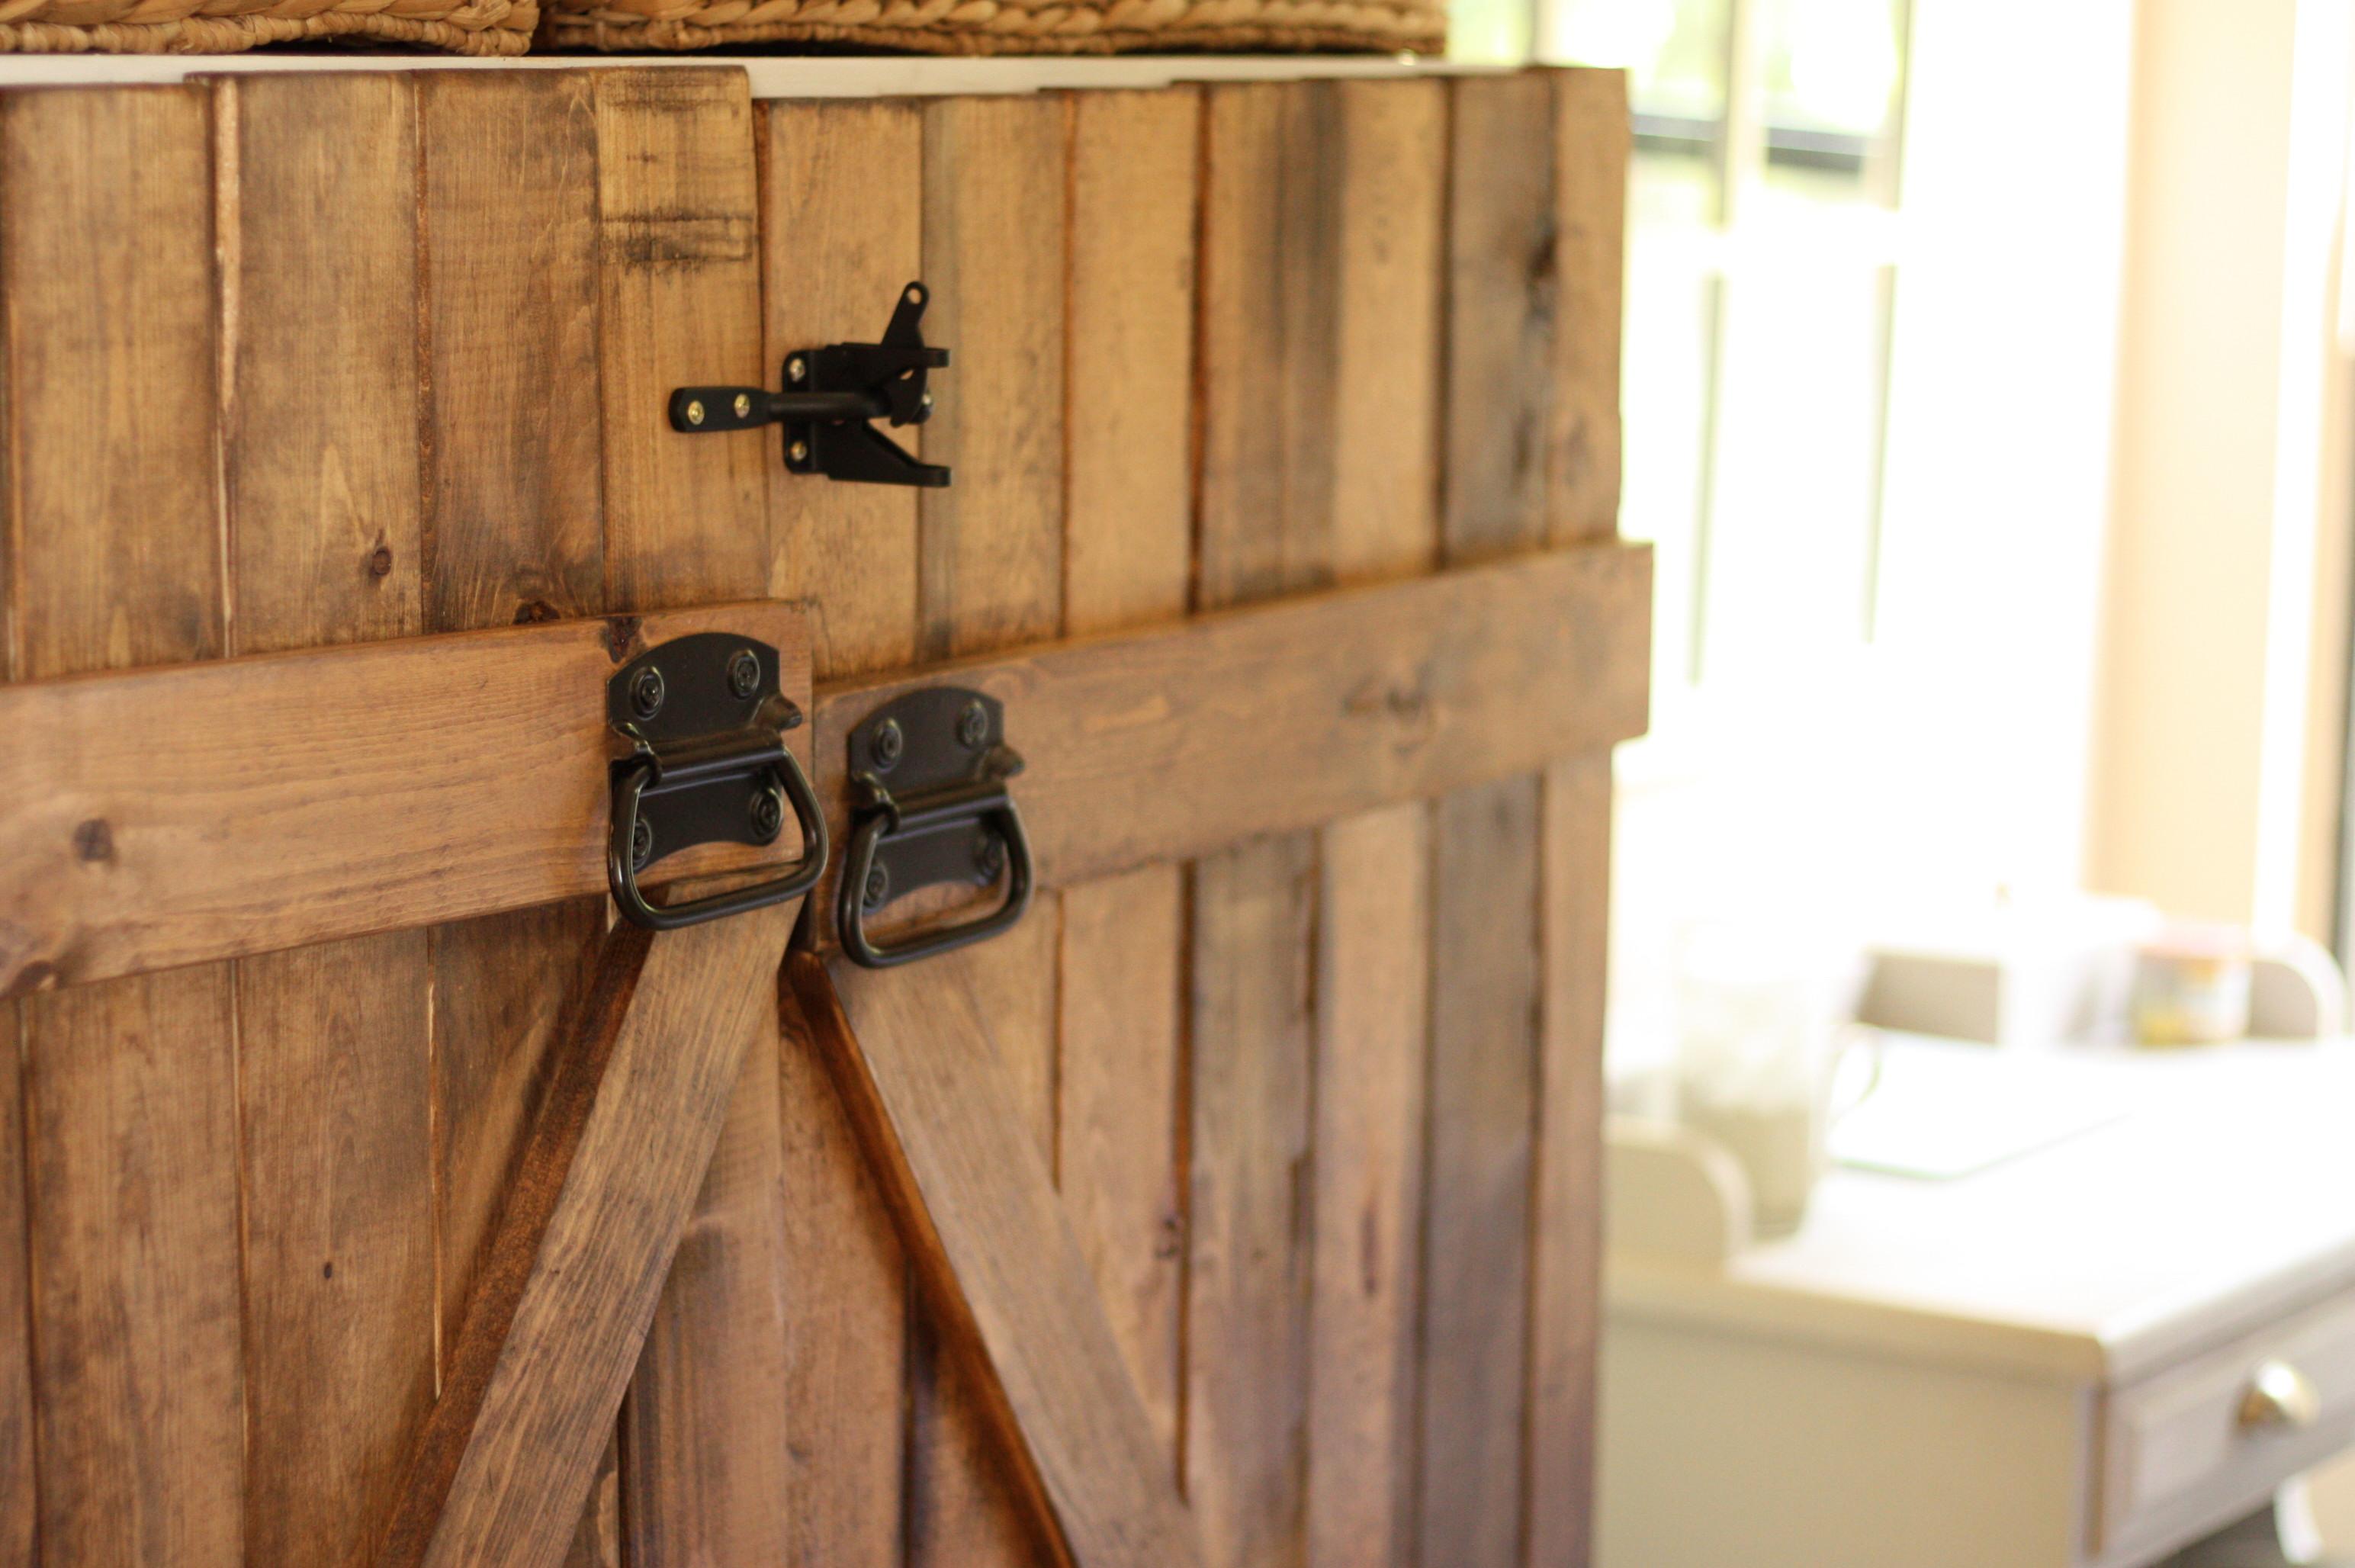 Barn Door Dresser|Bookshelf turned into a dresser|Meg Wallace|One Glass Slipper|DIY